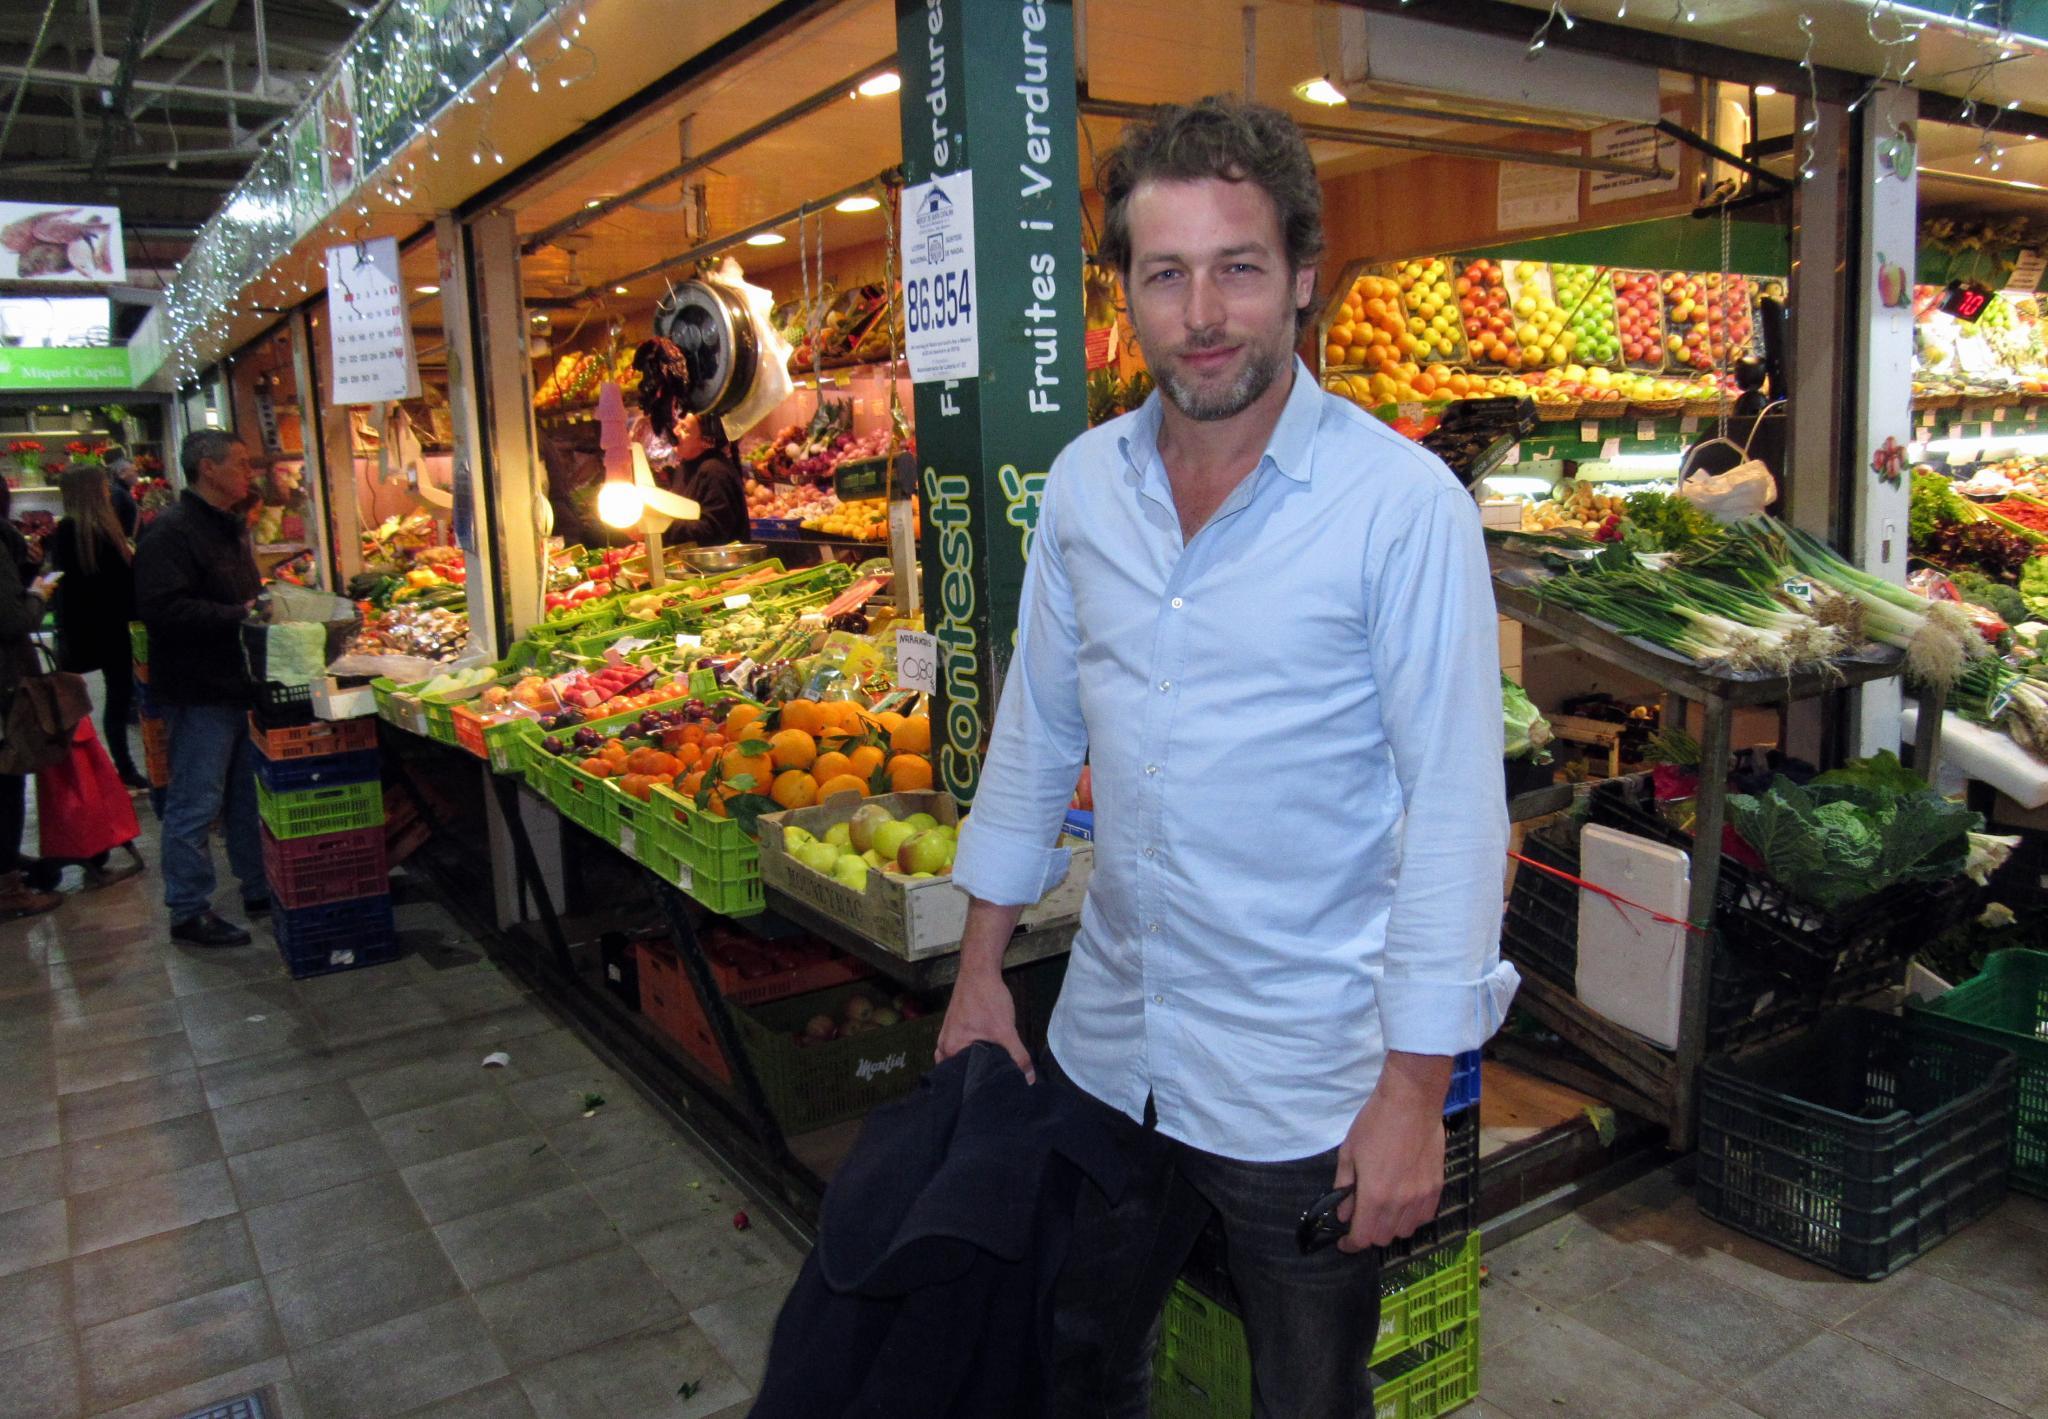 Julian Looman, The Mallorca Files, Santa Catalina, Palma